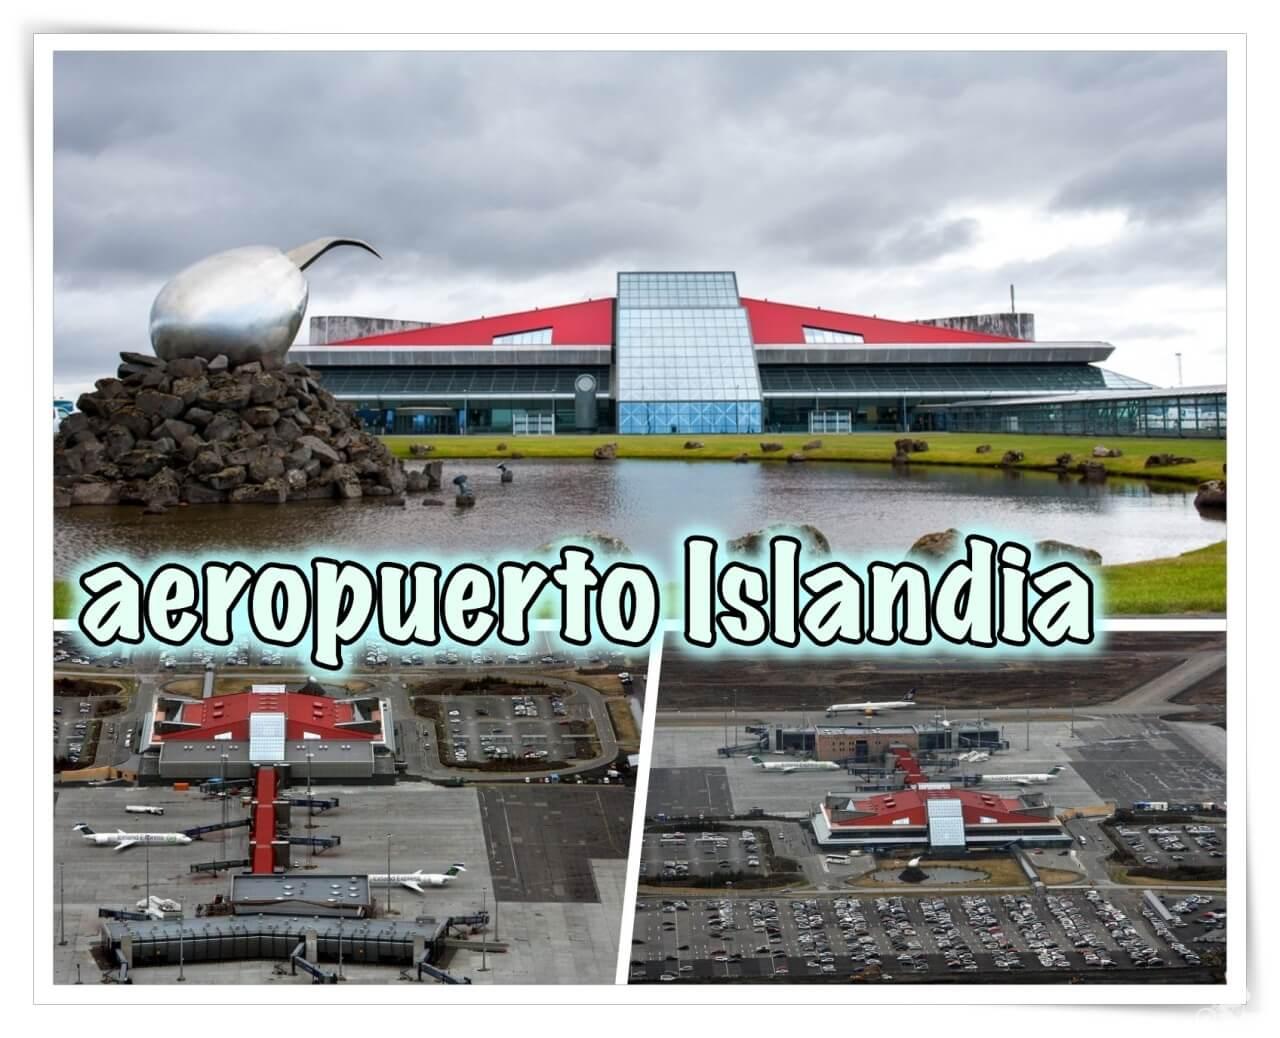 aeropuerto islandia